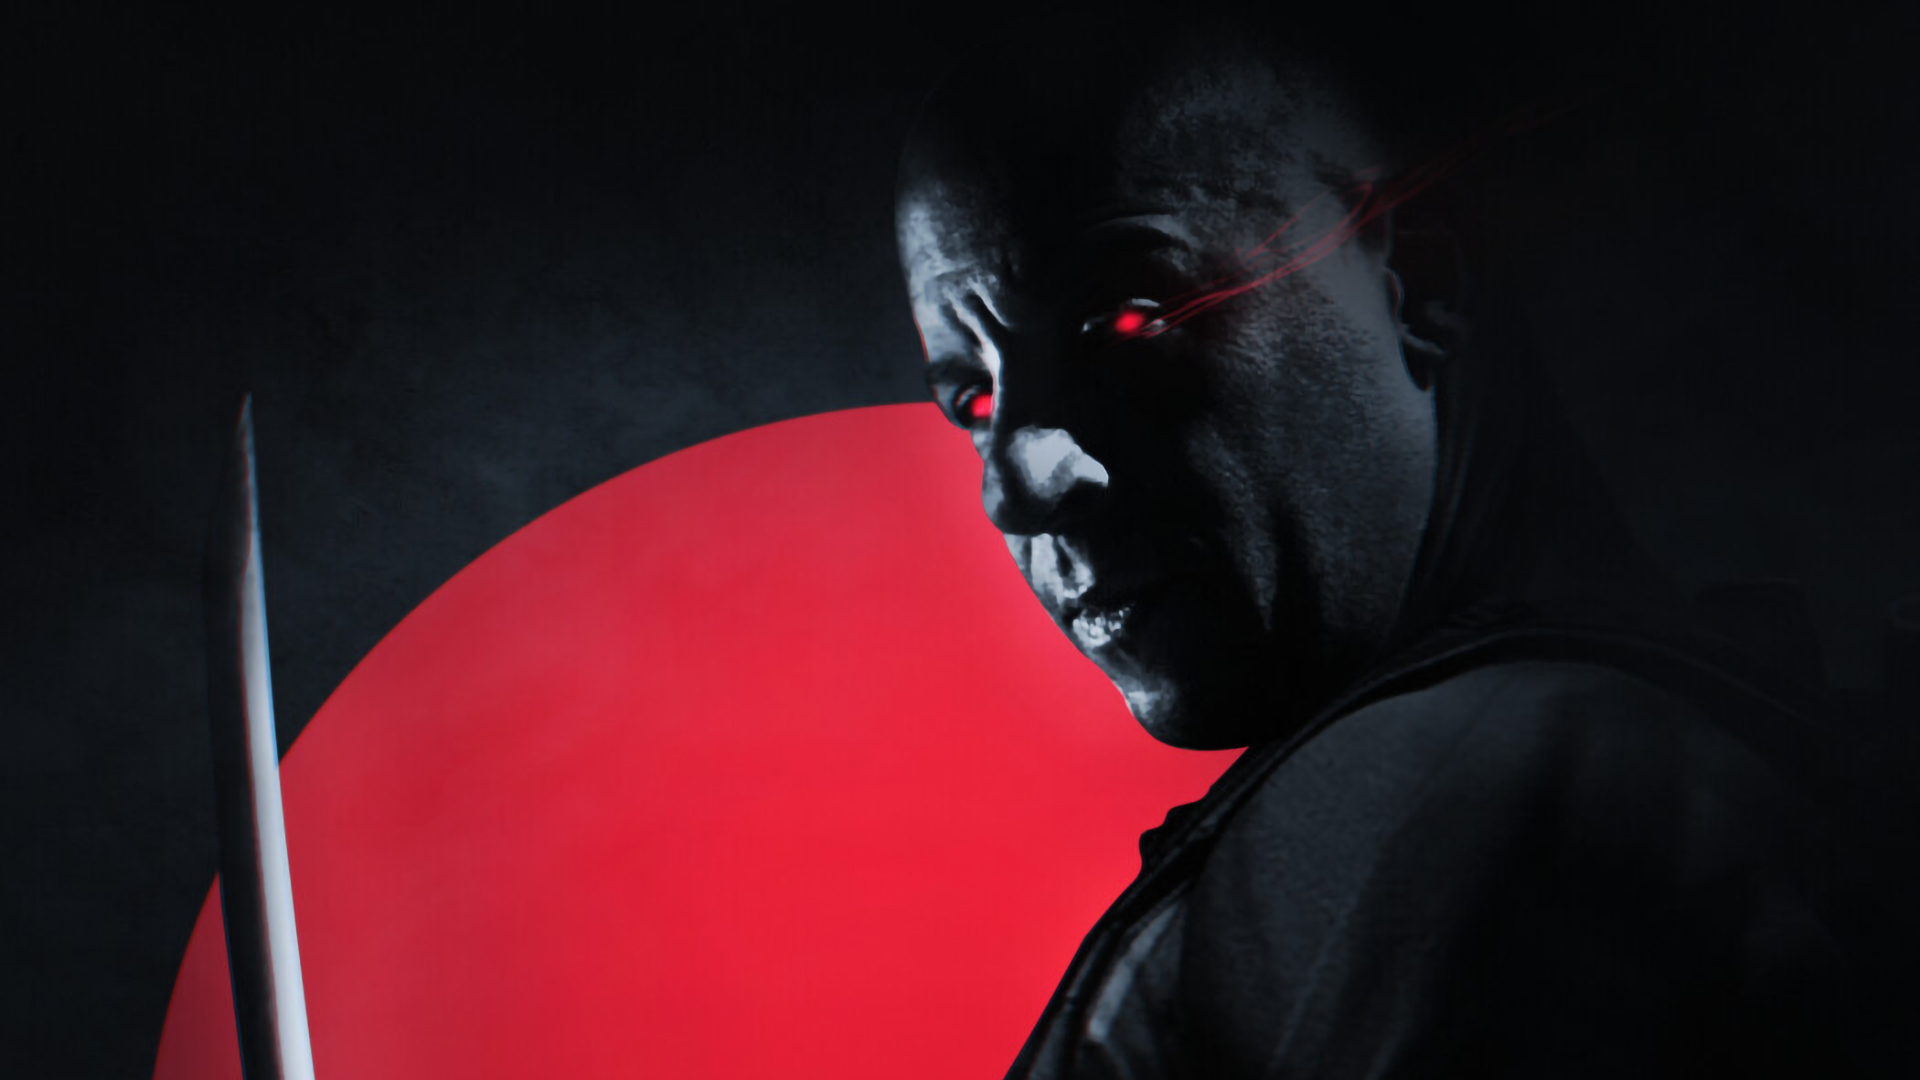 1920x1080 Vin Diesel Bloodshot Movie 2020 1080P Laptop Full HD 1920x1080